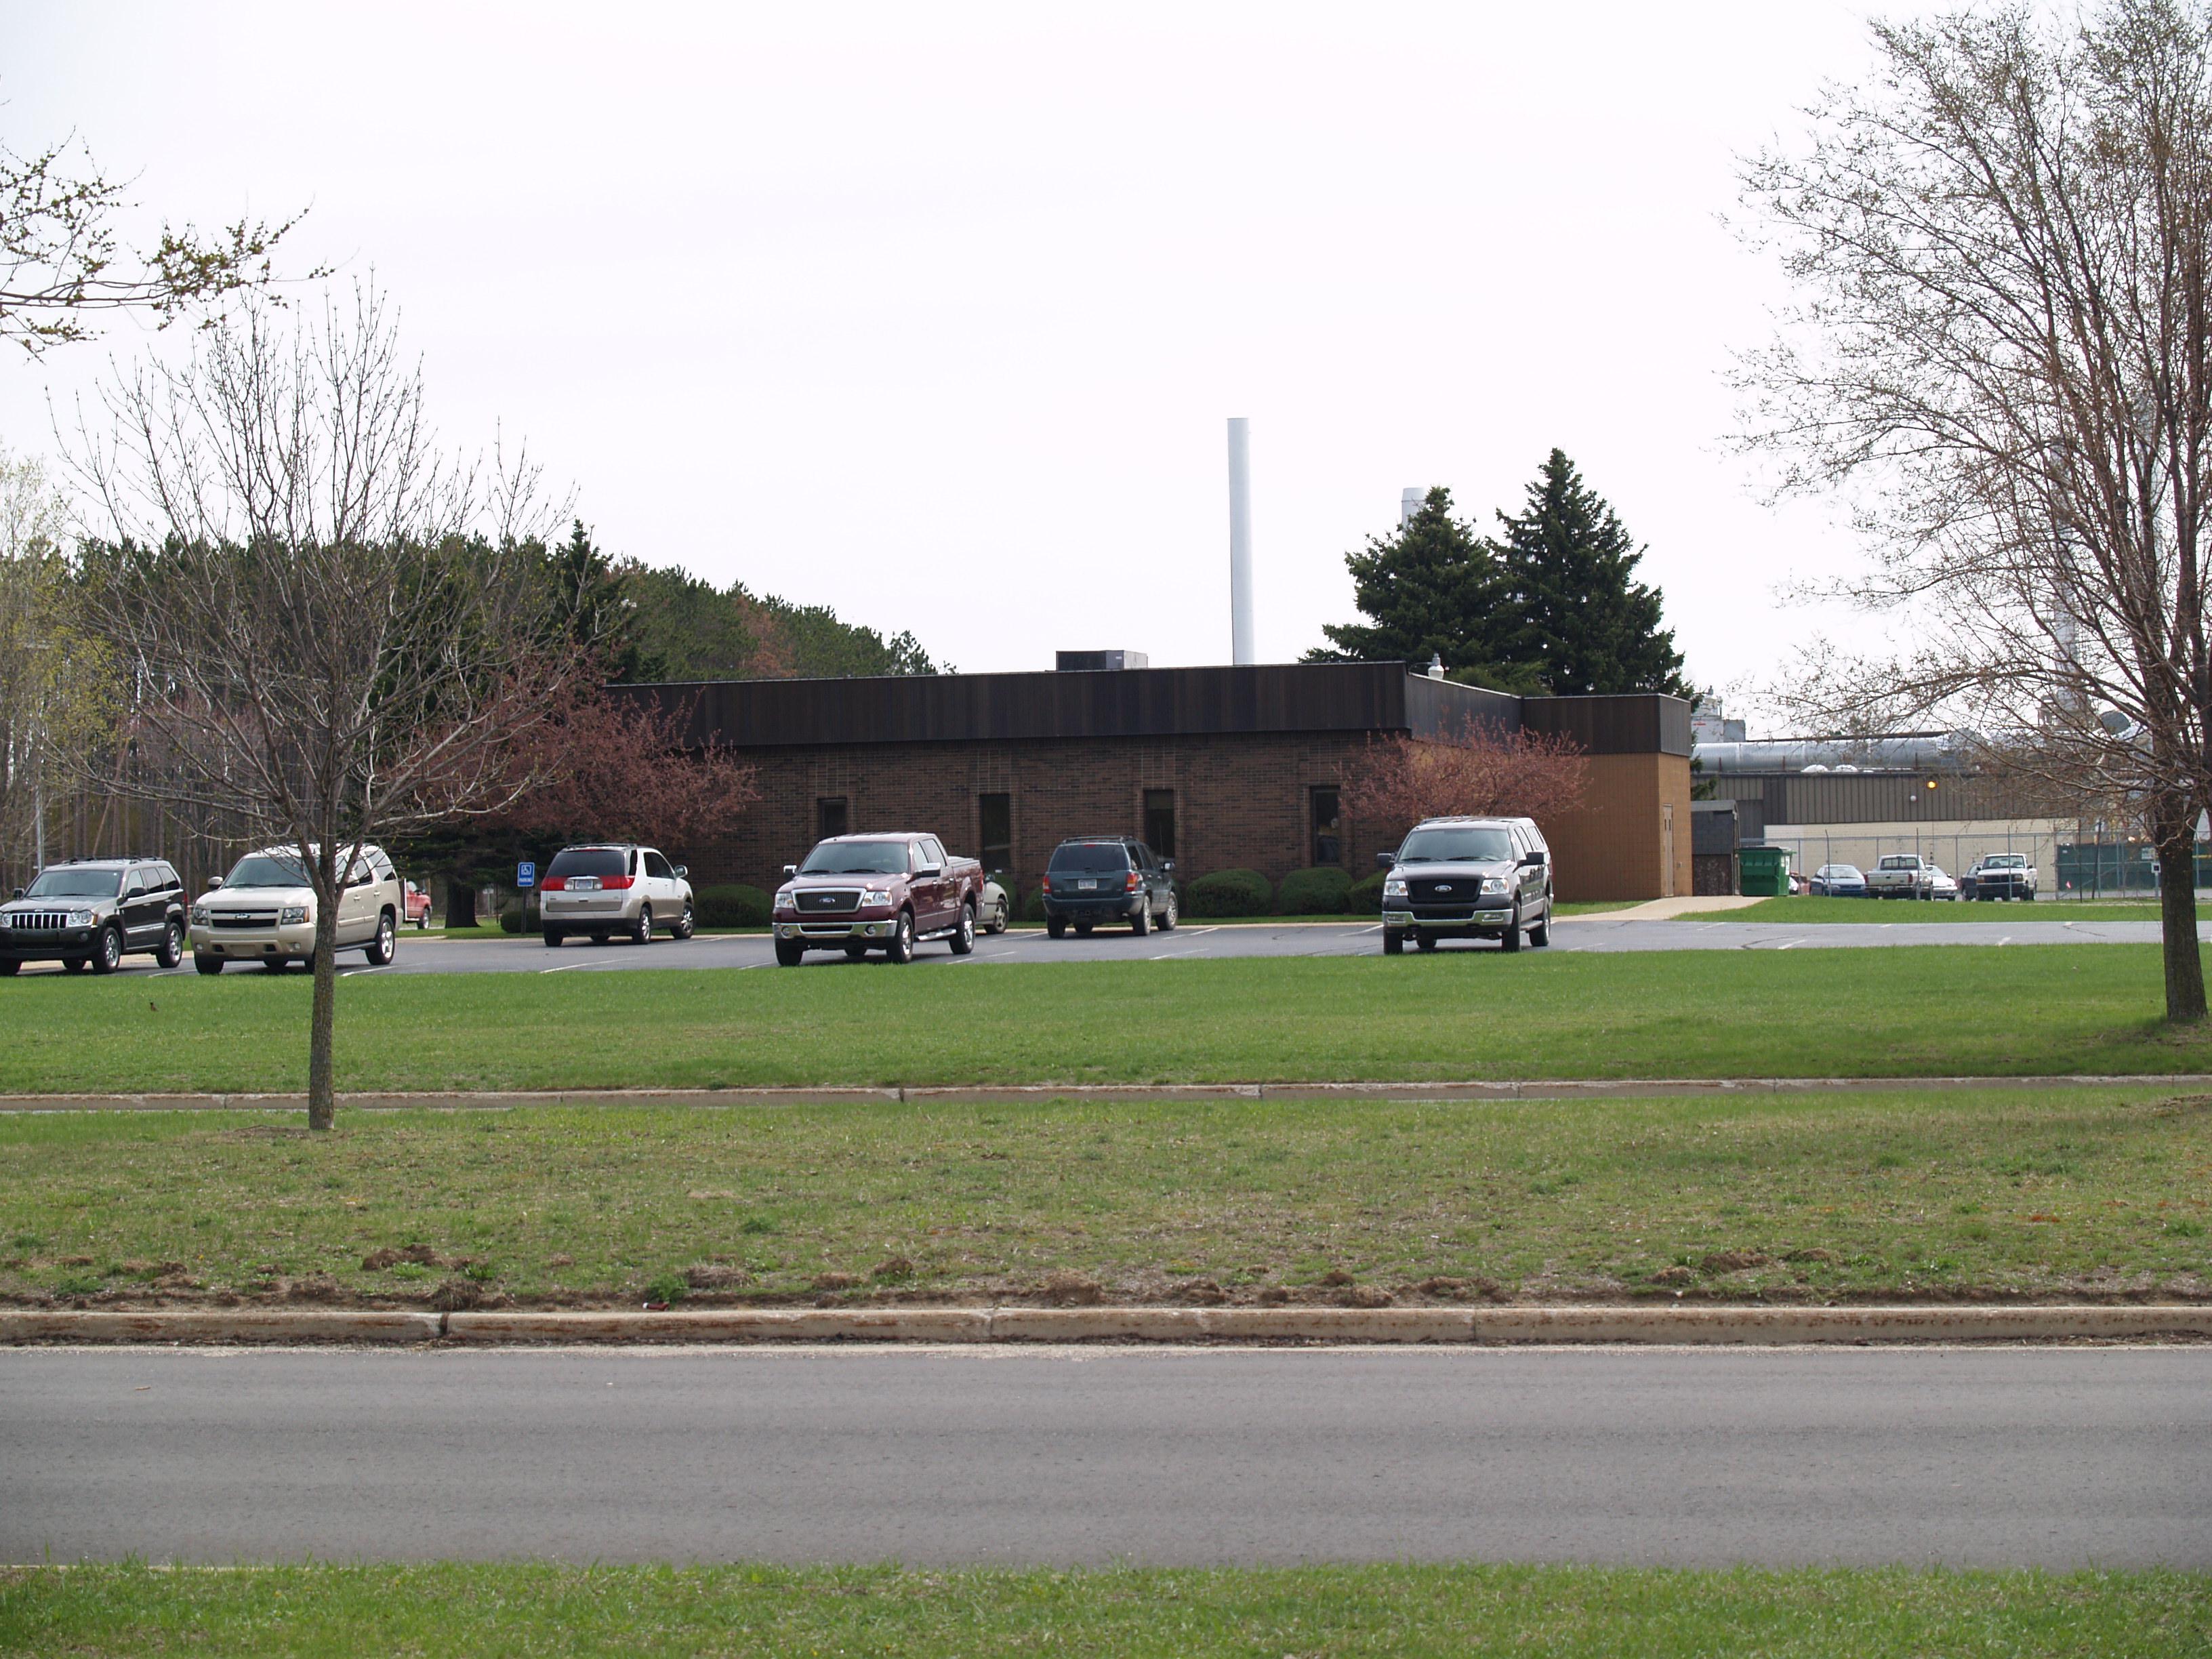 Cadillac MI Official Website Cadillac Industrial Park #4F5F30